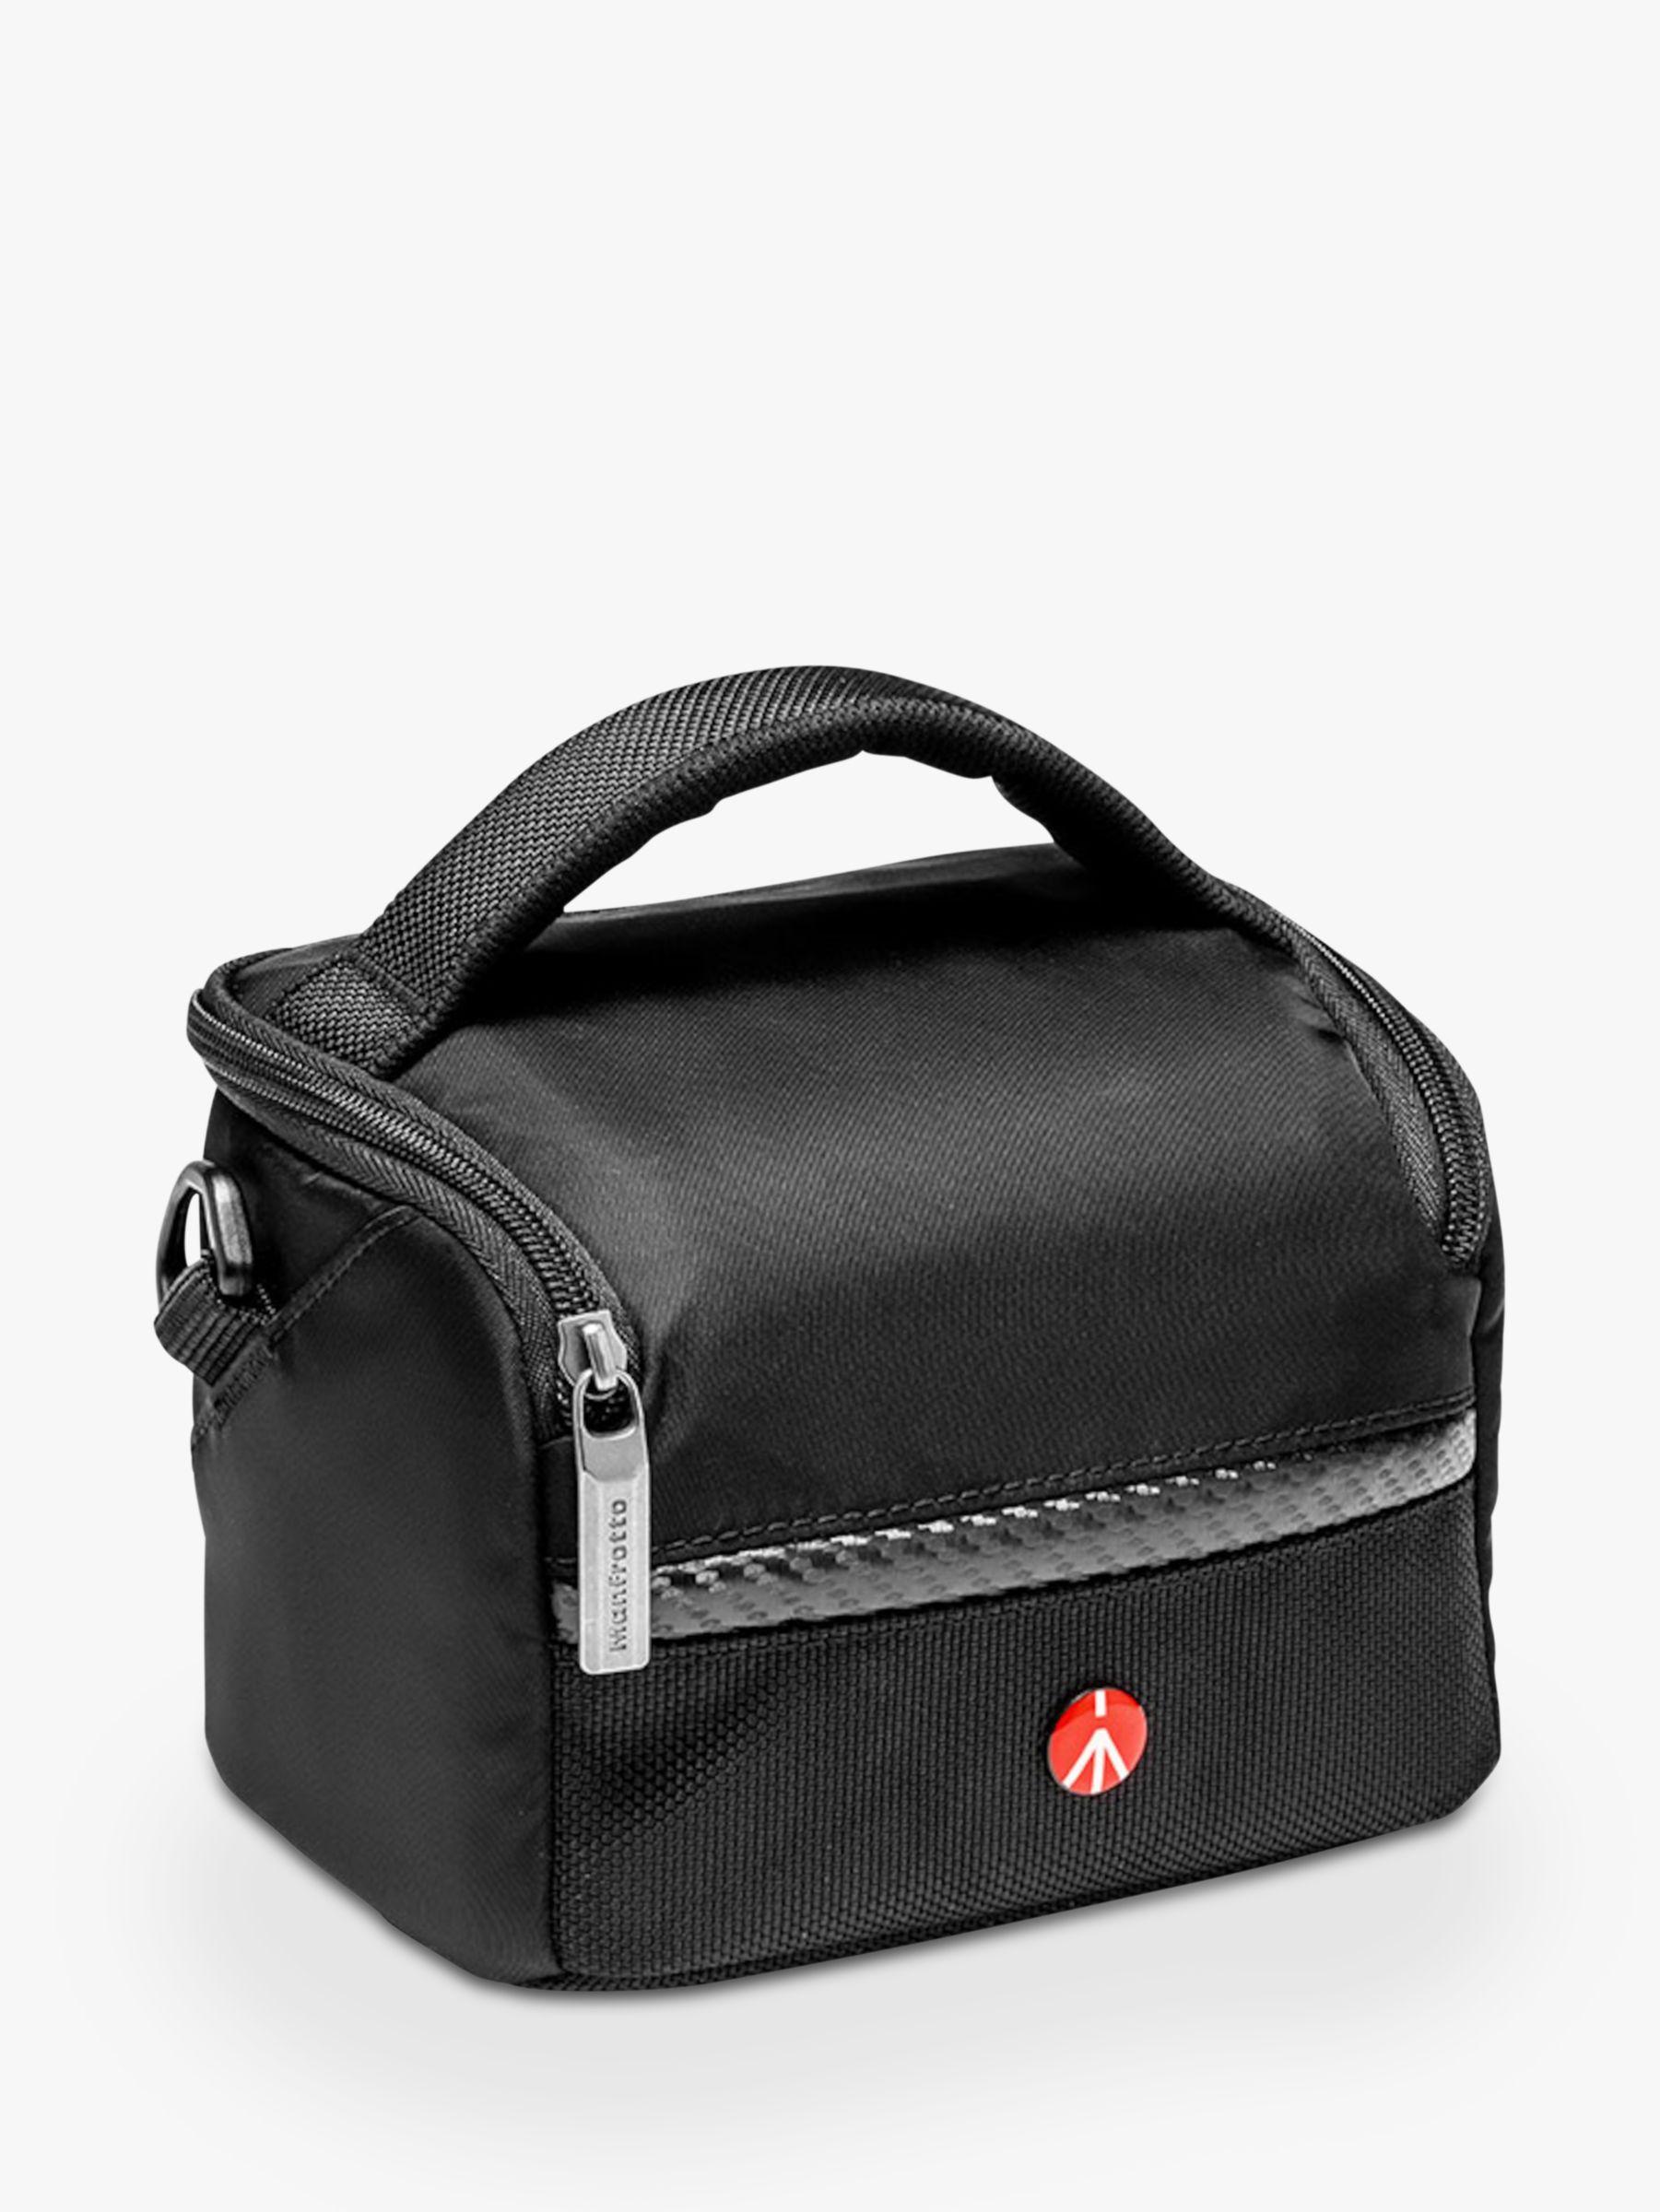 Manfrotto Manfrotto Advanced A1 Camera Shoulder Bag for CSCs, Black